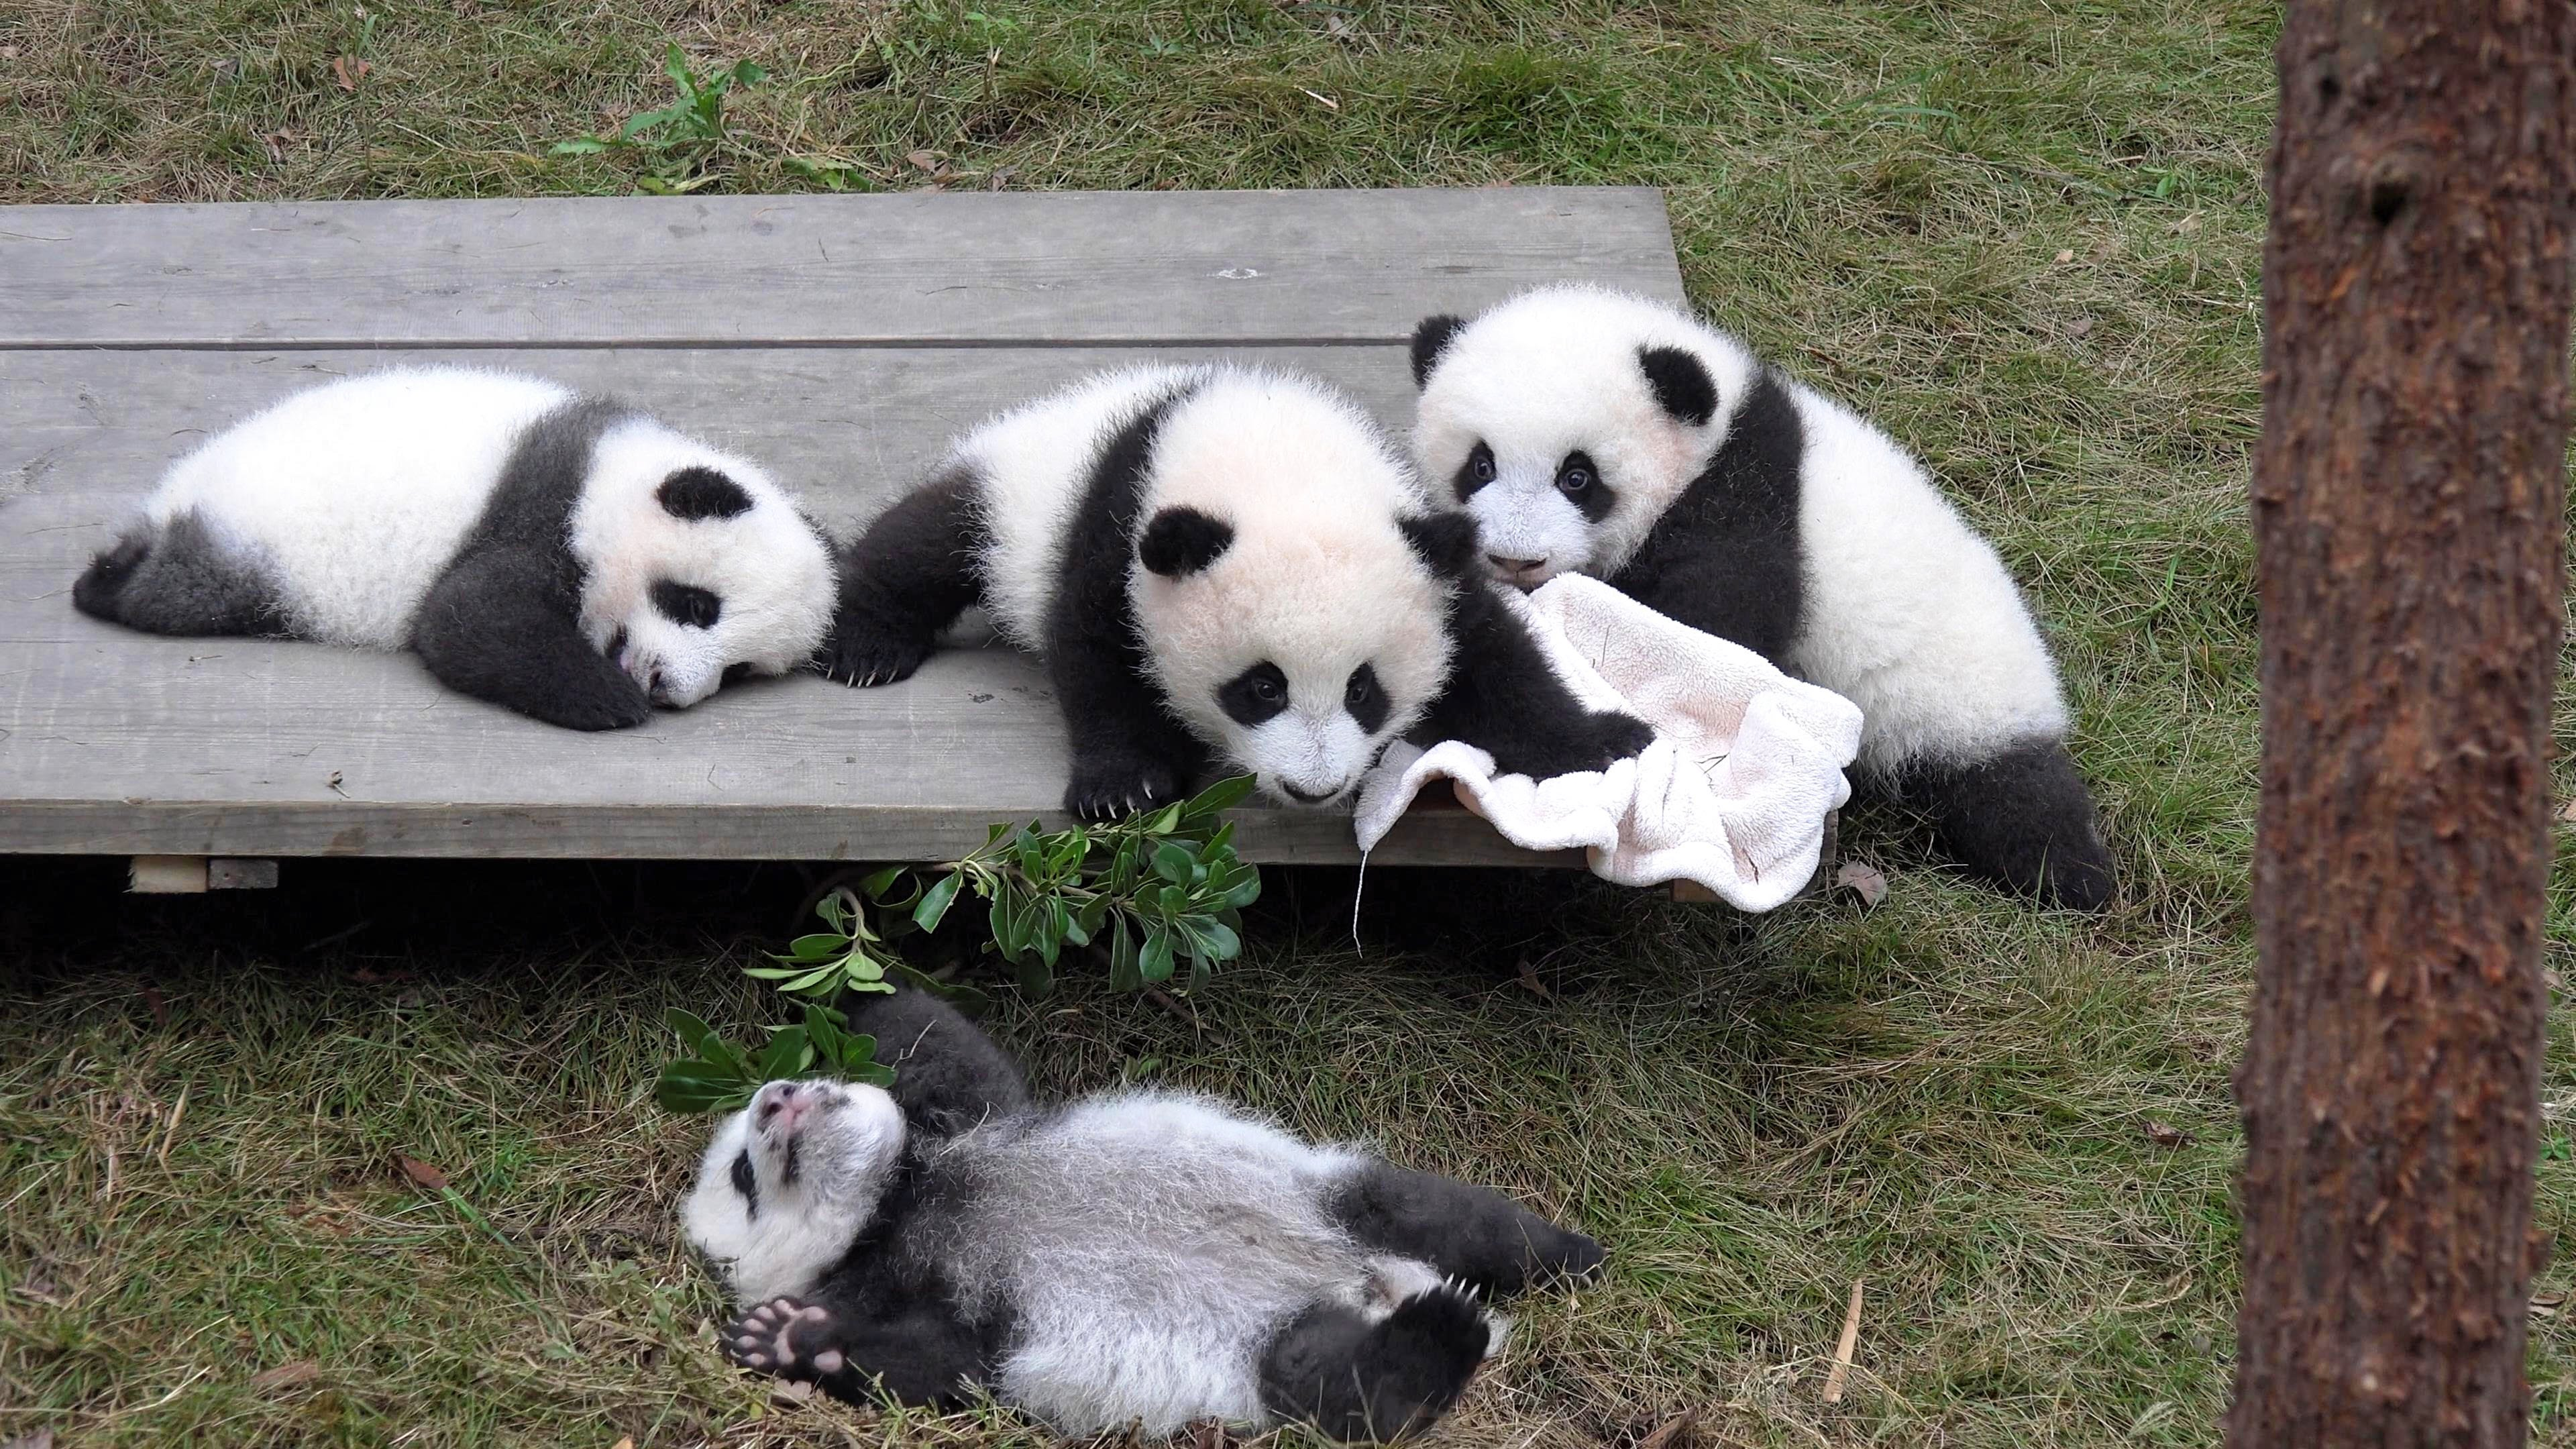 Giant Panda Breeding Center, Chengdu, China in 4K (Ultra HD) - YouTube